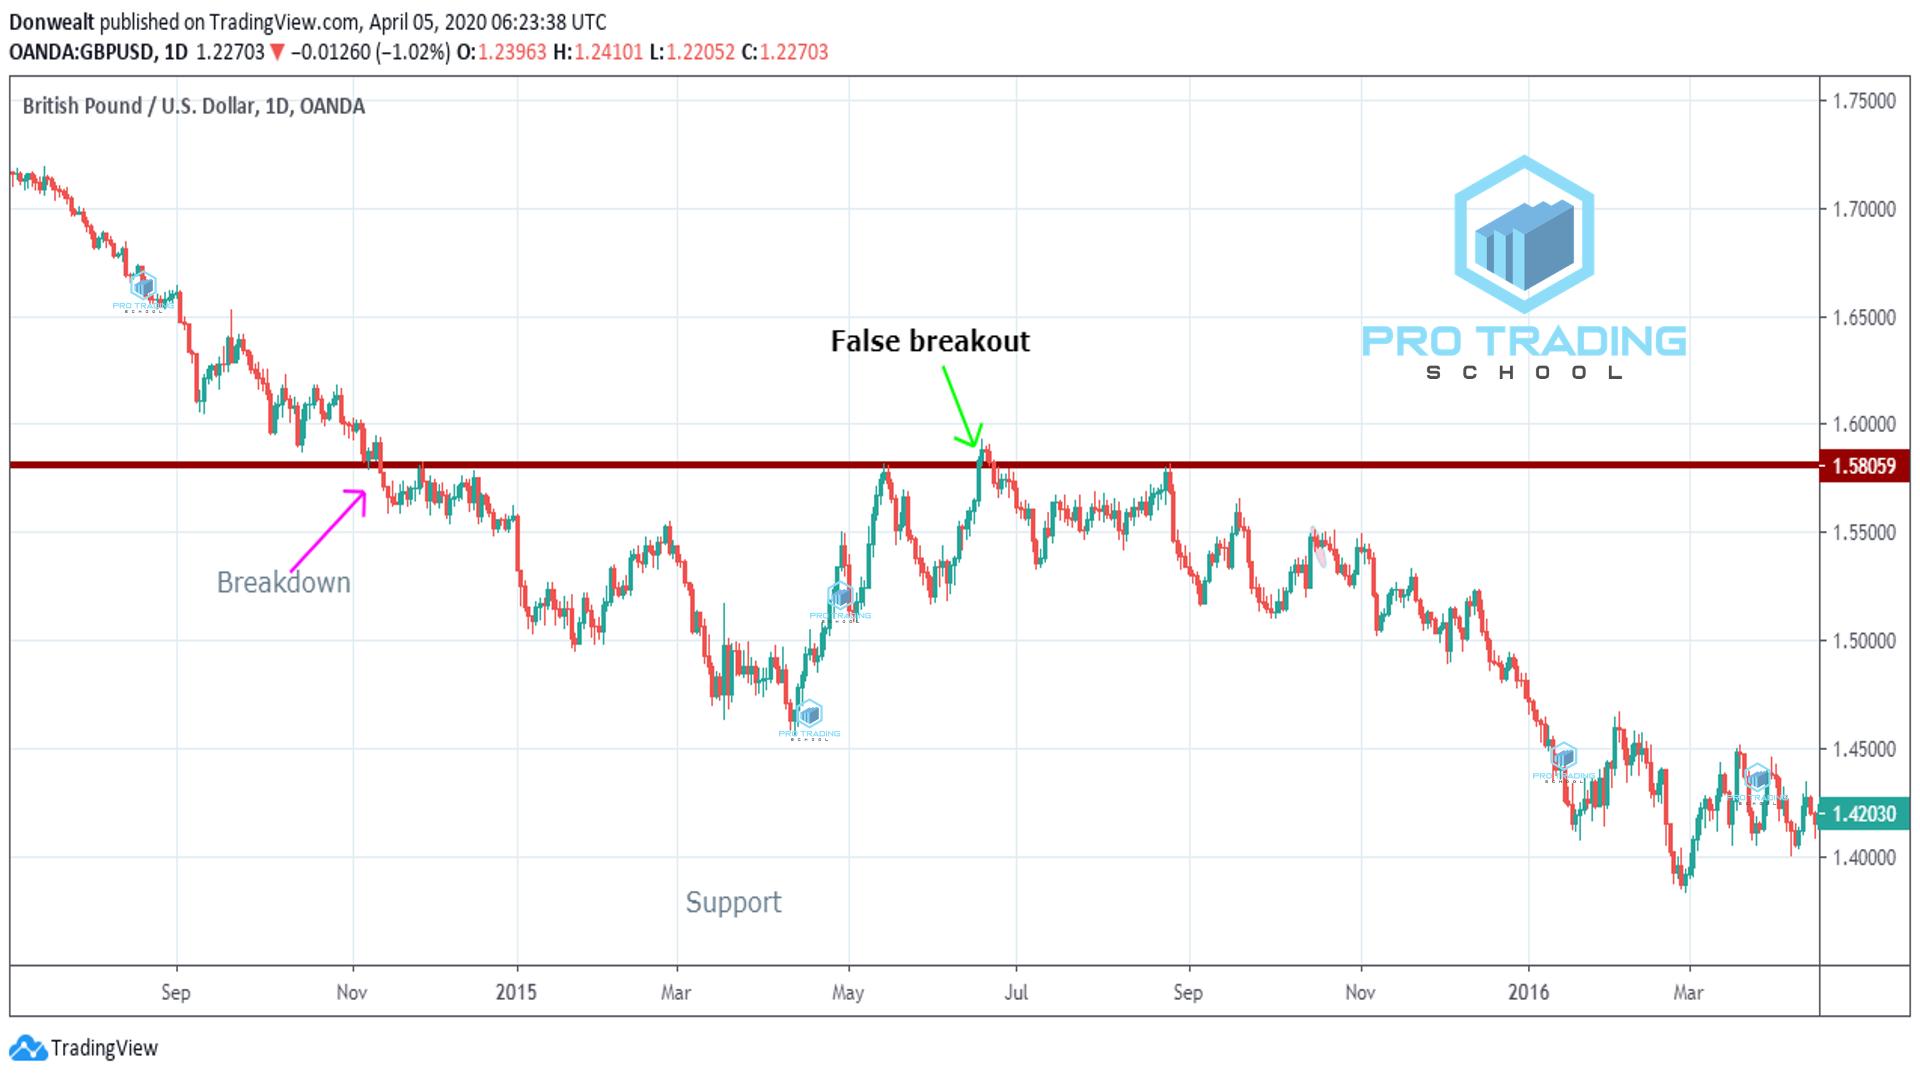 false-breakout-trading